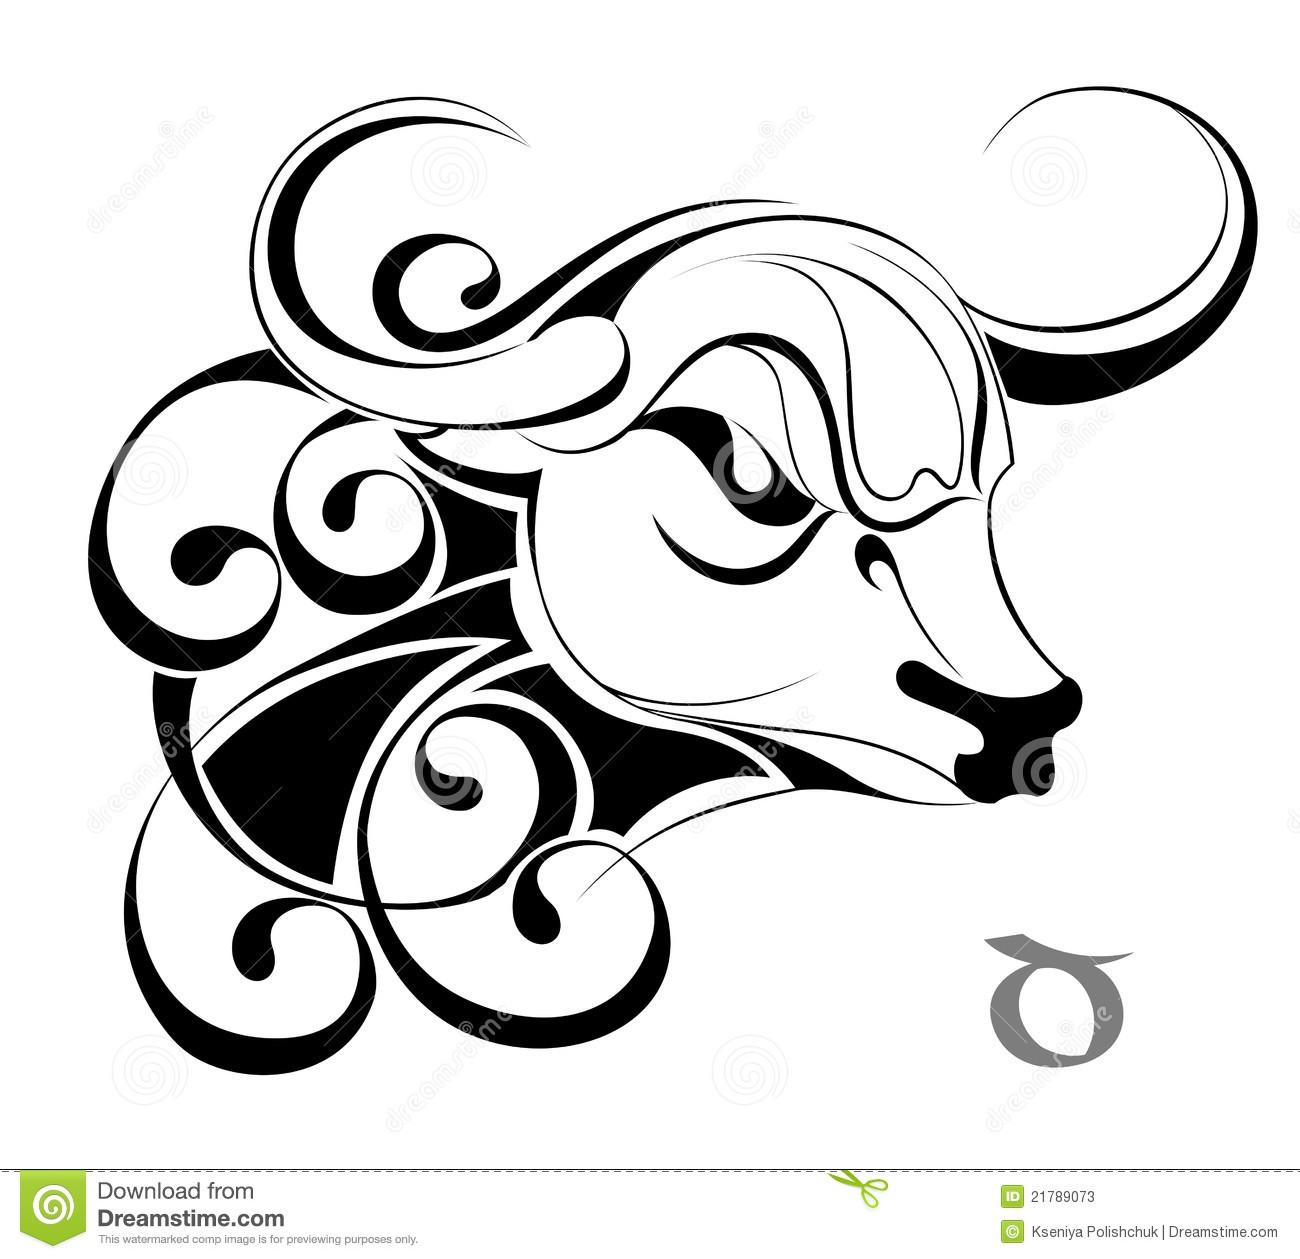 63 Taurus Zodiac Sign Tattoo And Designs